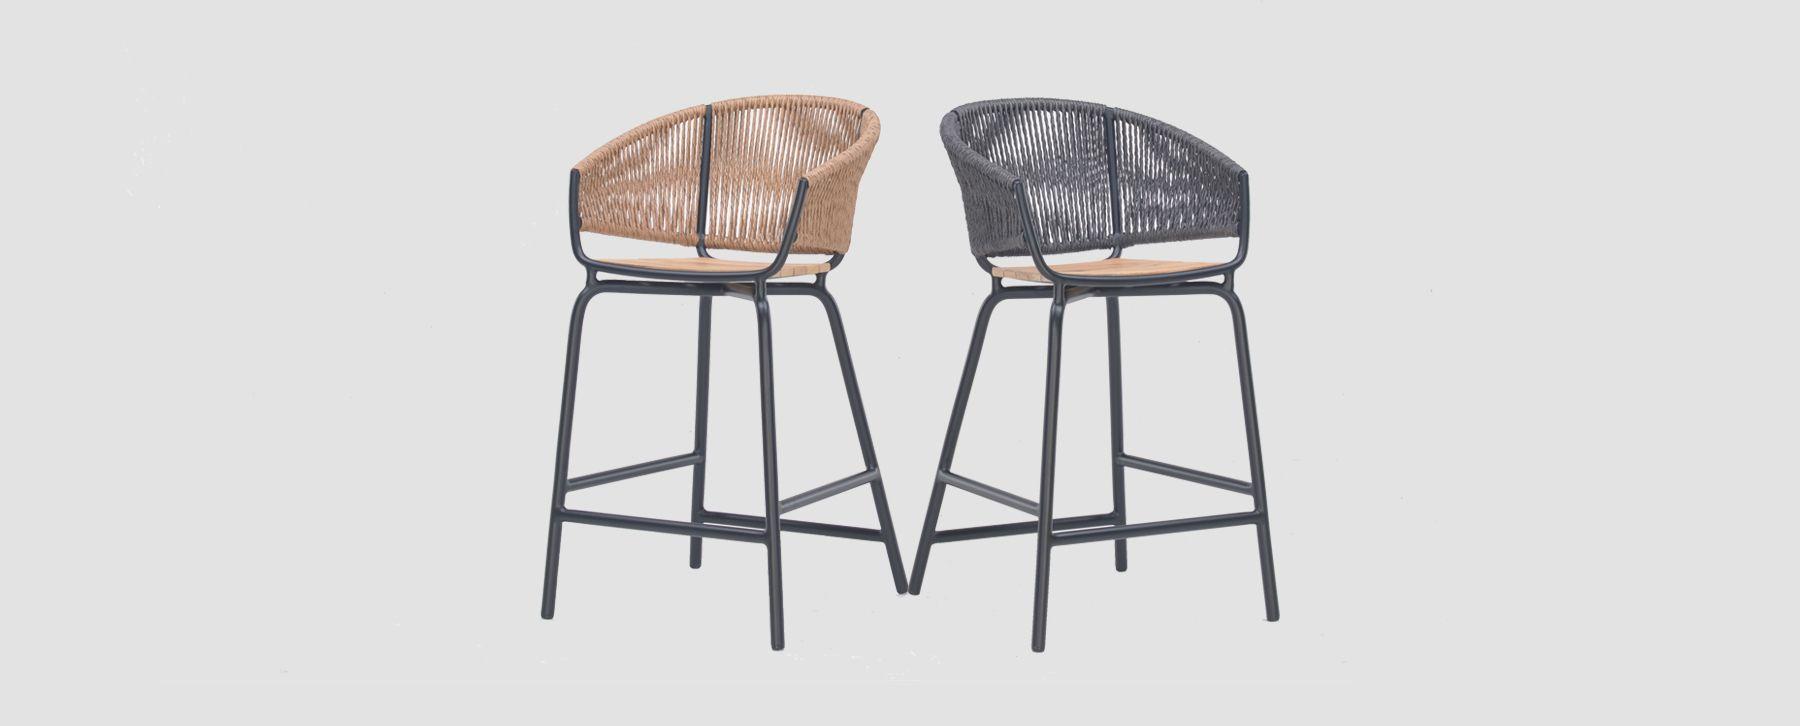 Enjoyable Modern Aluminum Rope Weave Bar Stool Organic Quick Dry Hand Bralicious Painted Fabric Chair Ideas Braliciousco